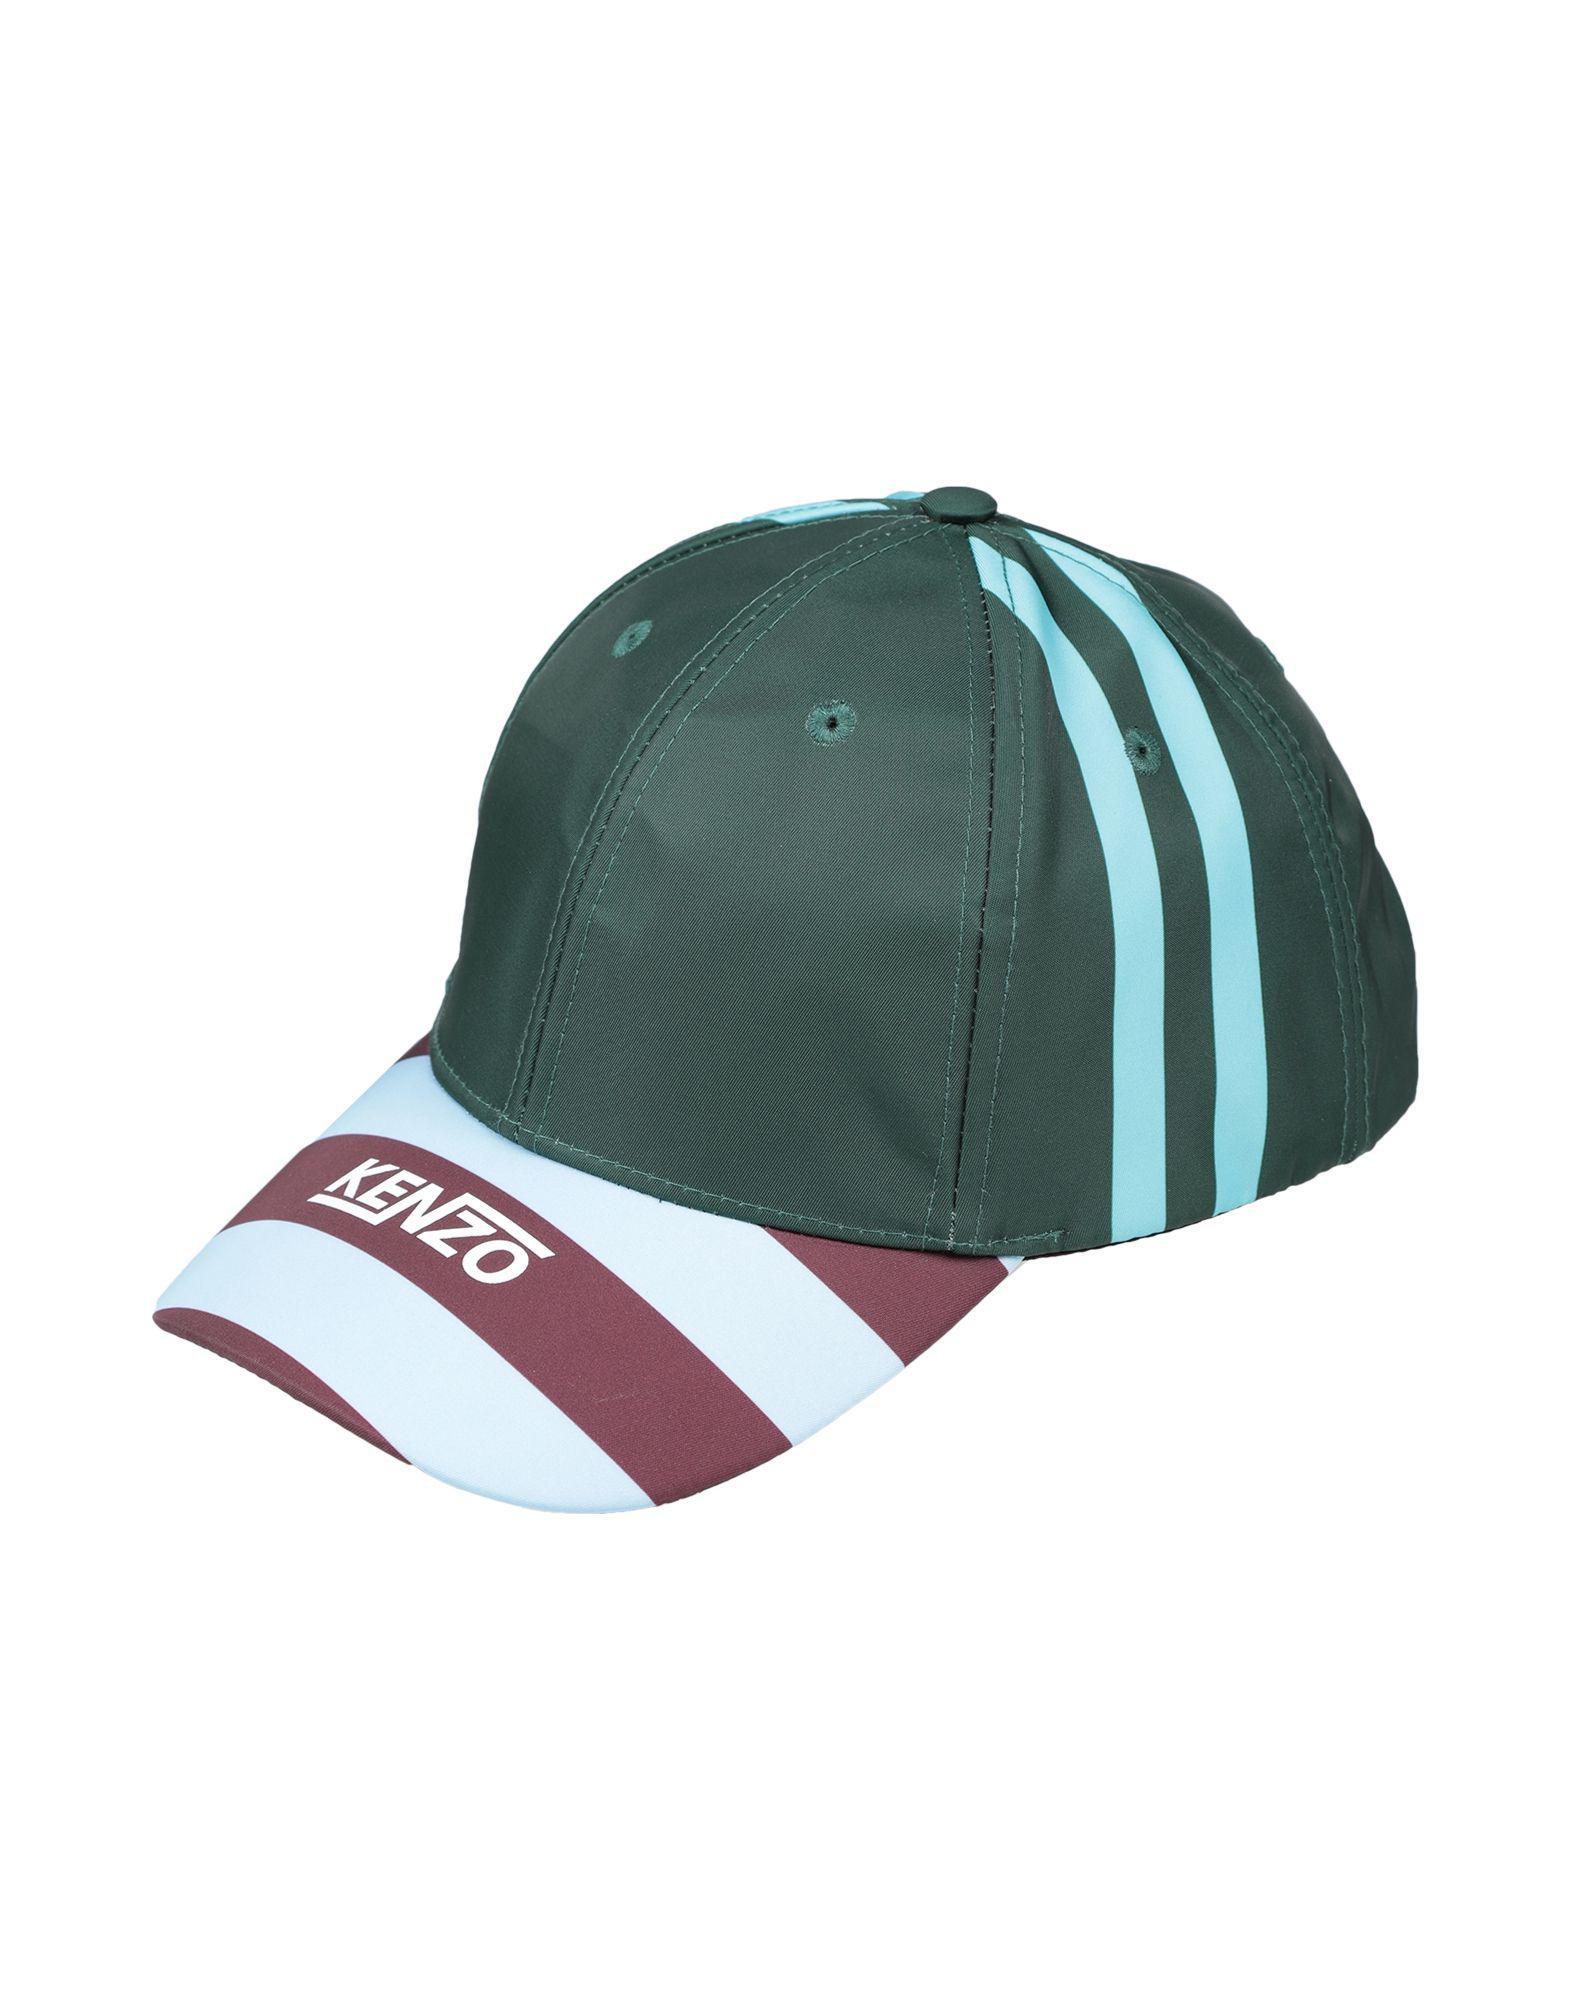 4e3175e5 Lyst - KENZO Hat in Green for Men